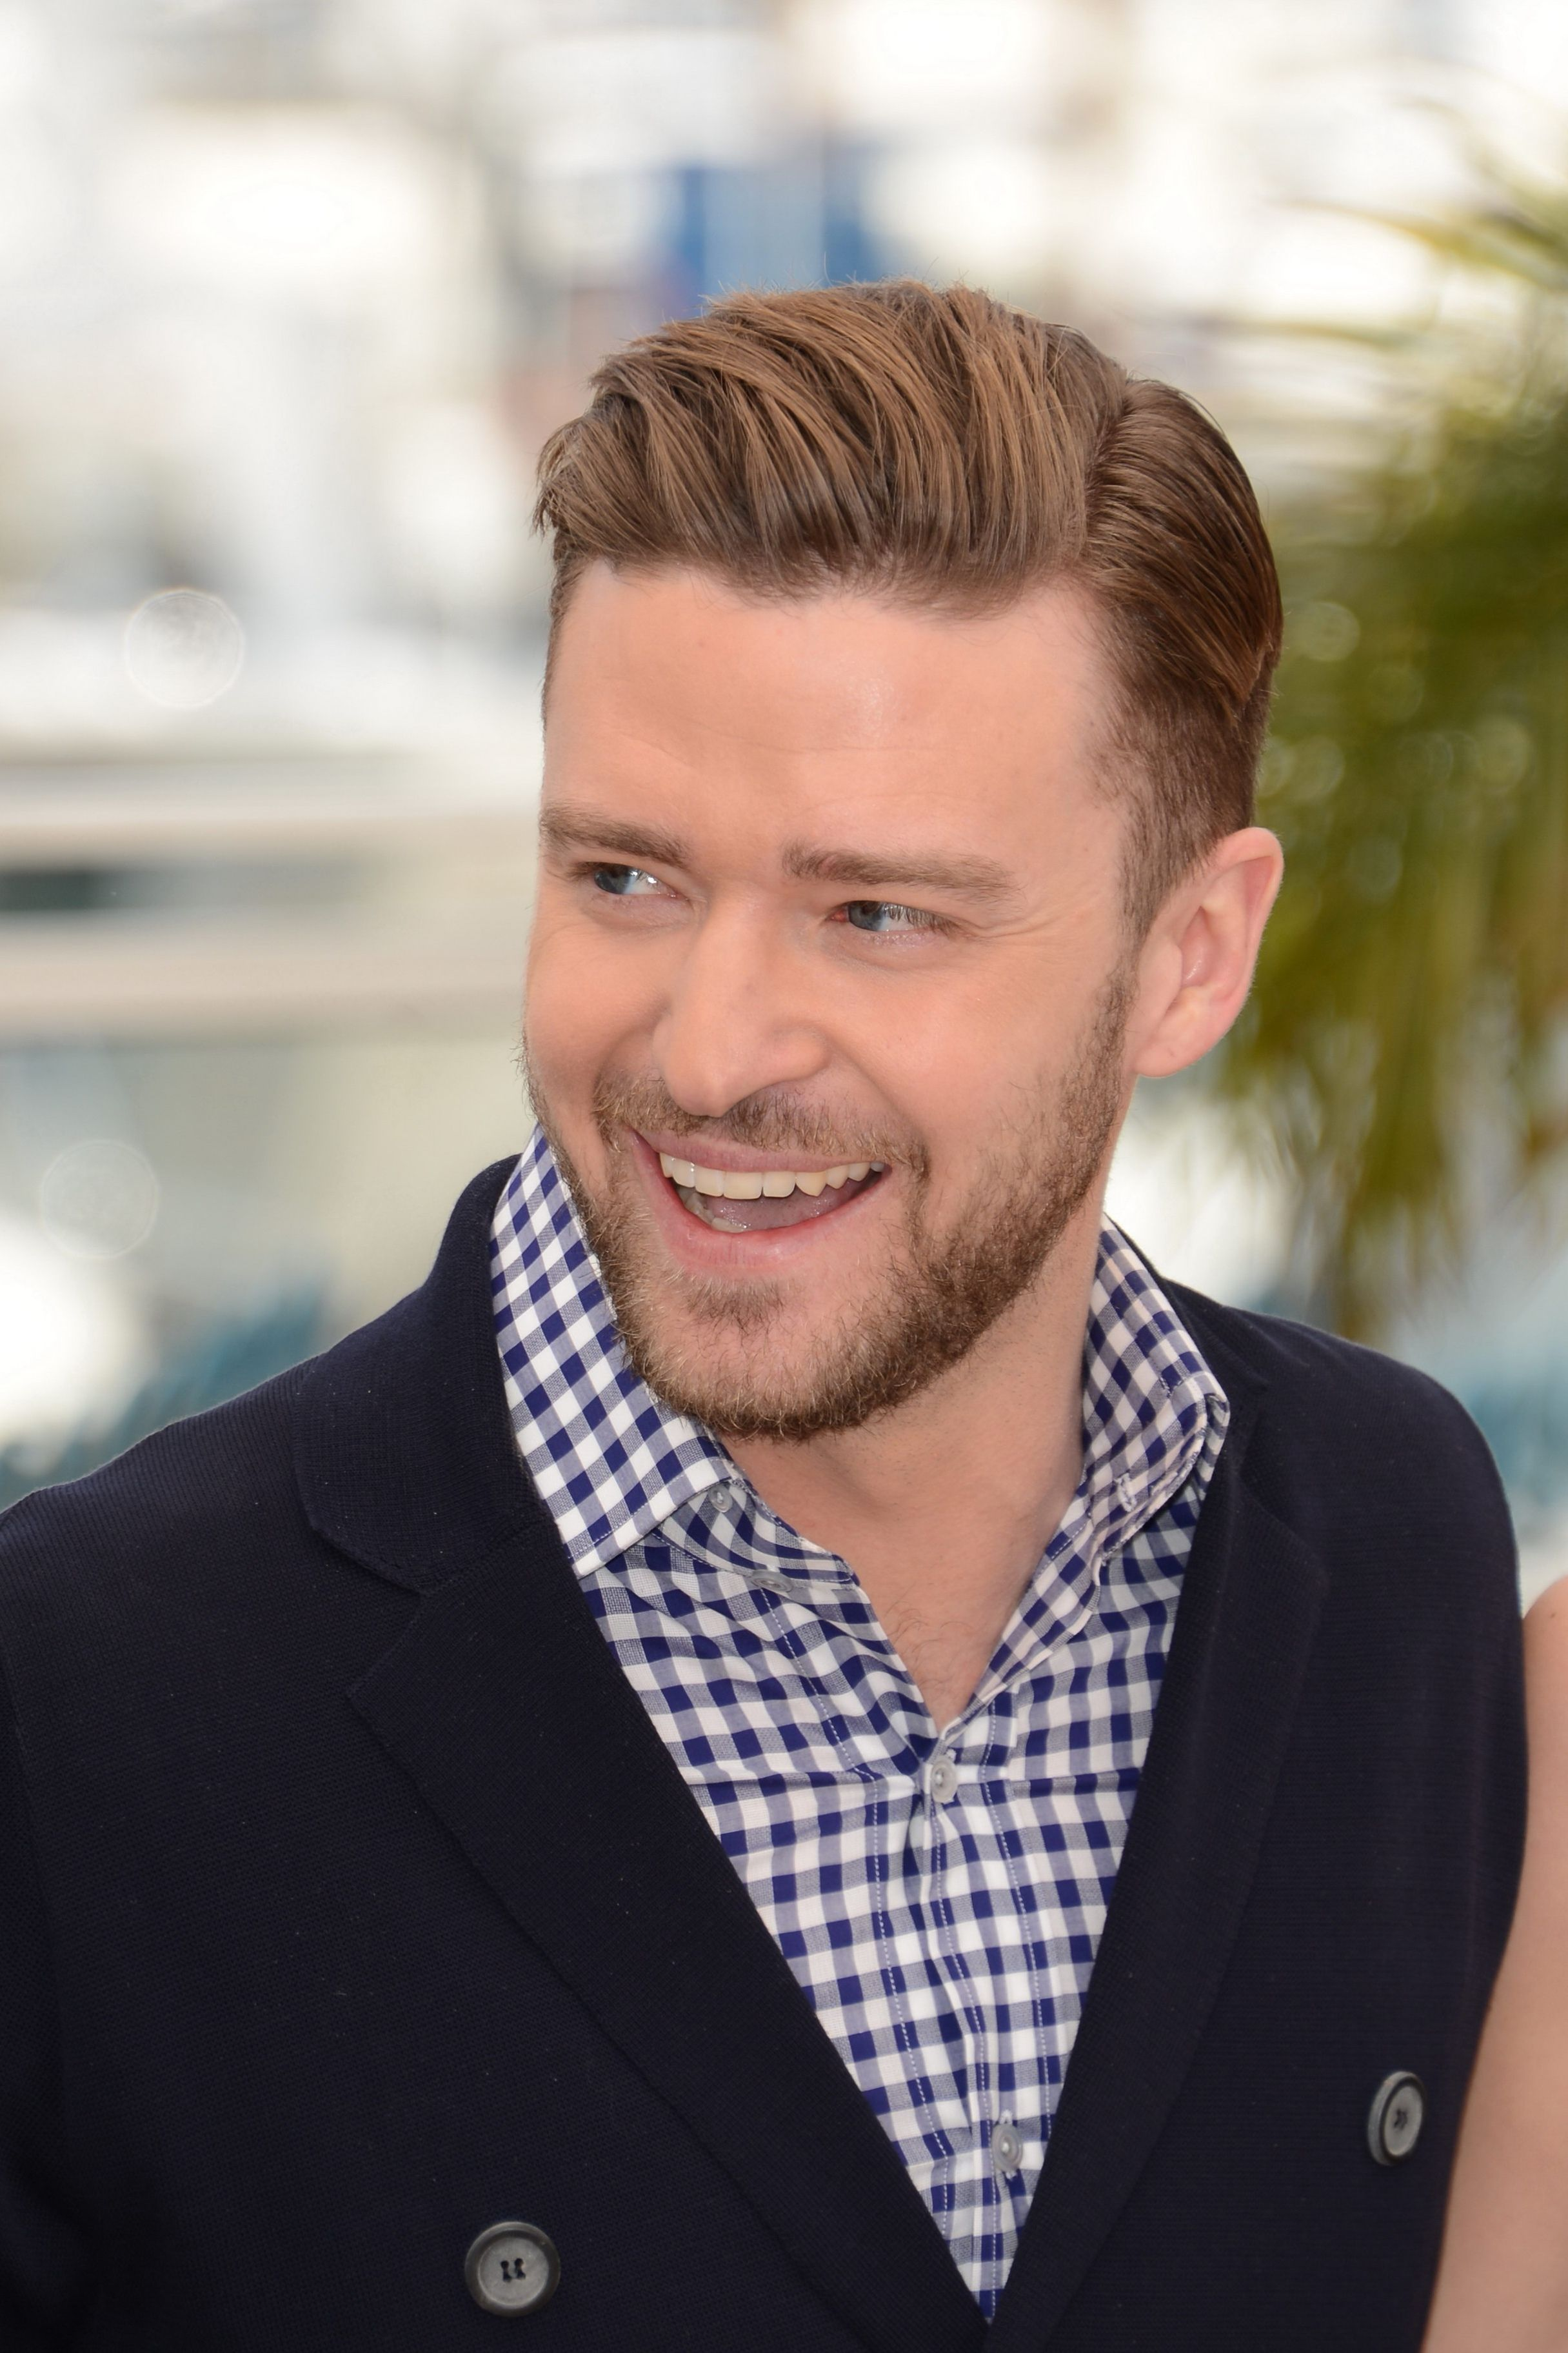 Justin Timberlake Hair Background 1 HD Wallpapers ...